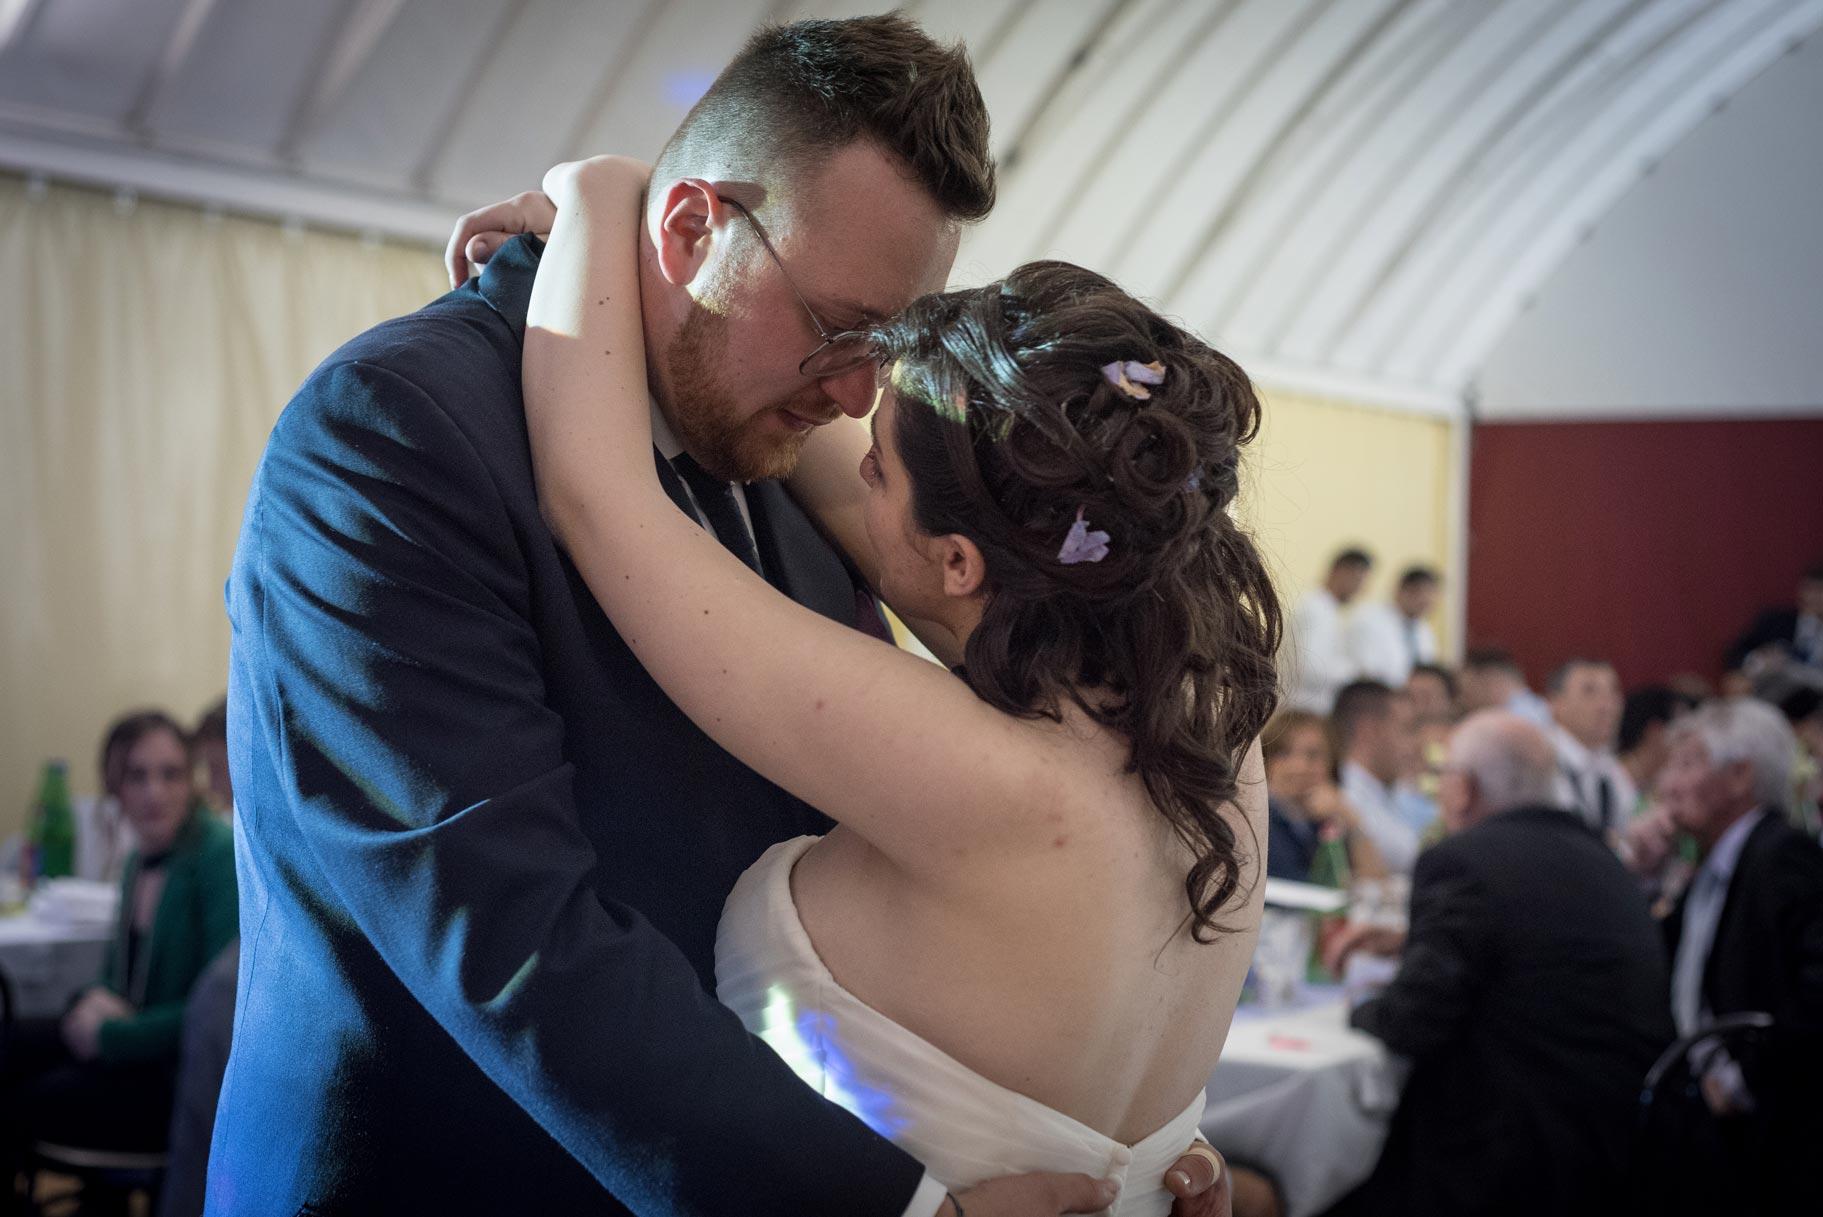 Matrimonio a Narzole Lorenza Diego - DSC 3428 - Fotografie matrimonio ballo - Fotografie matrimonio ballo